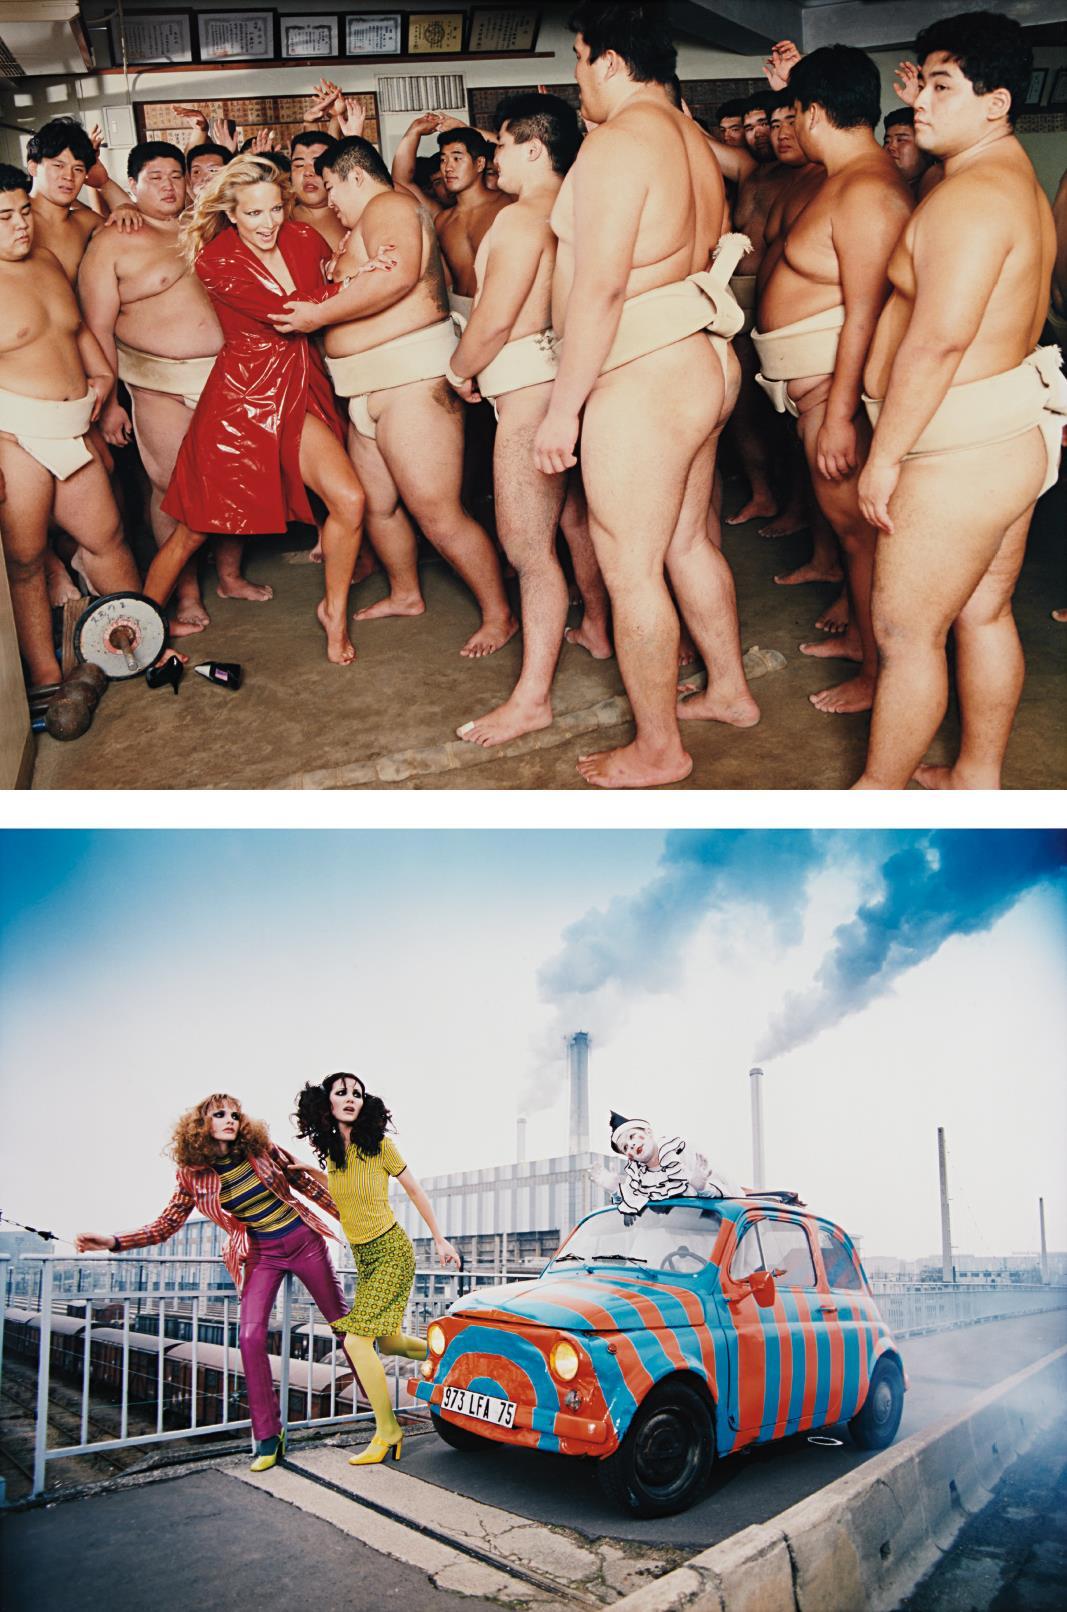 David LaChapelle-Two Works: (i) Pierrot Story, Paris; (ii) Rachel And Sumo Wrestlers, Tokyo-1995